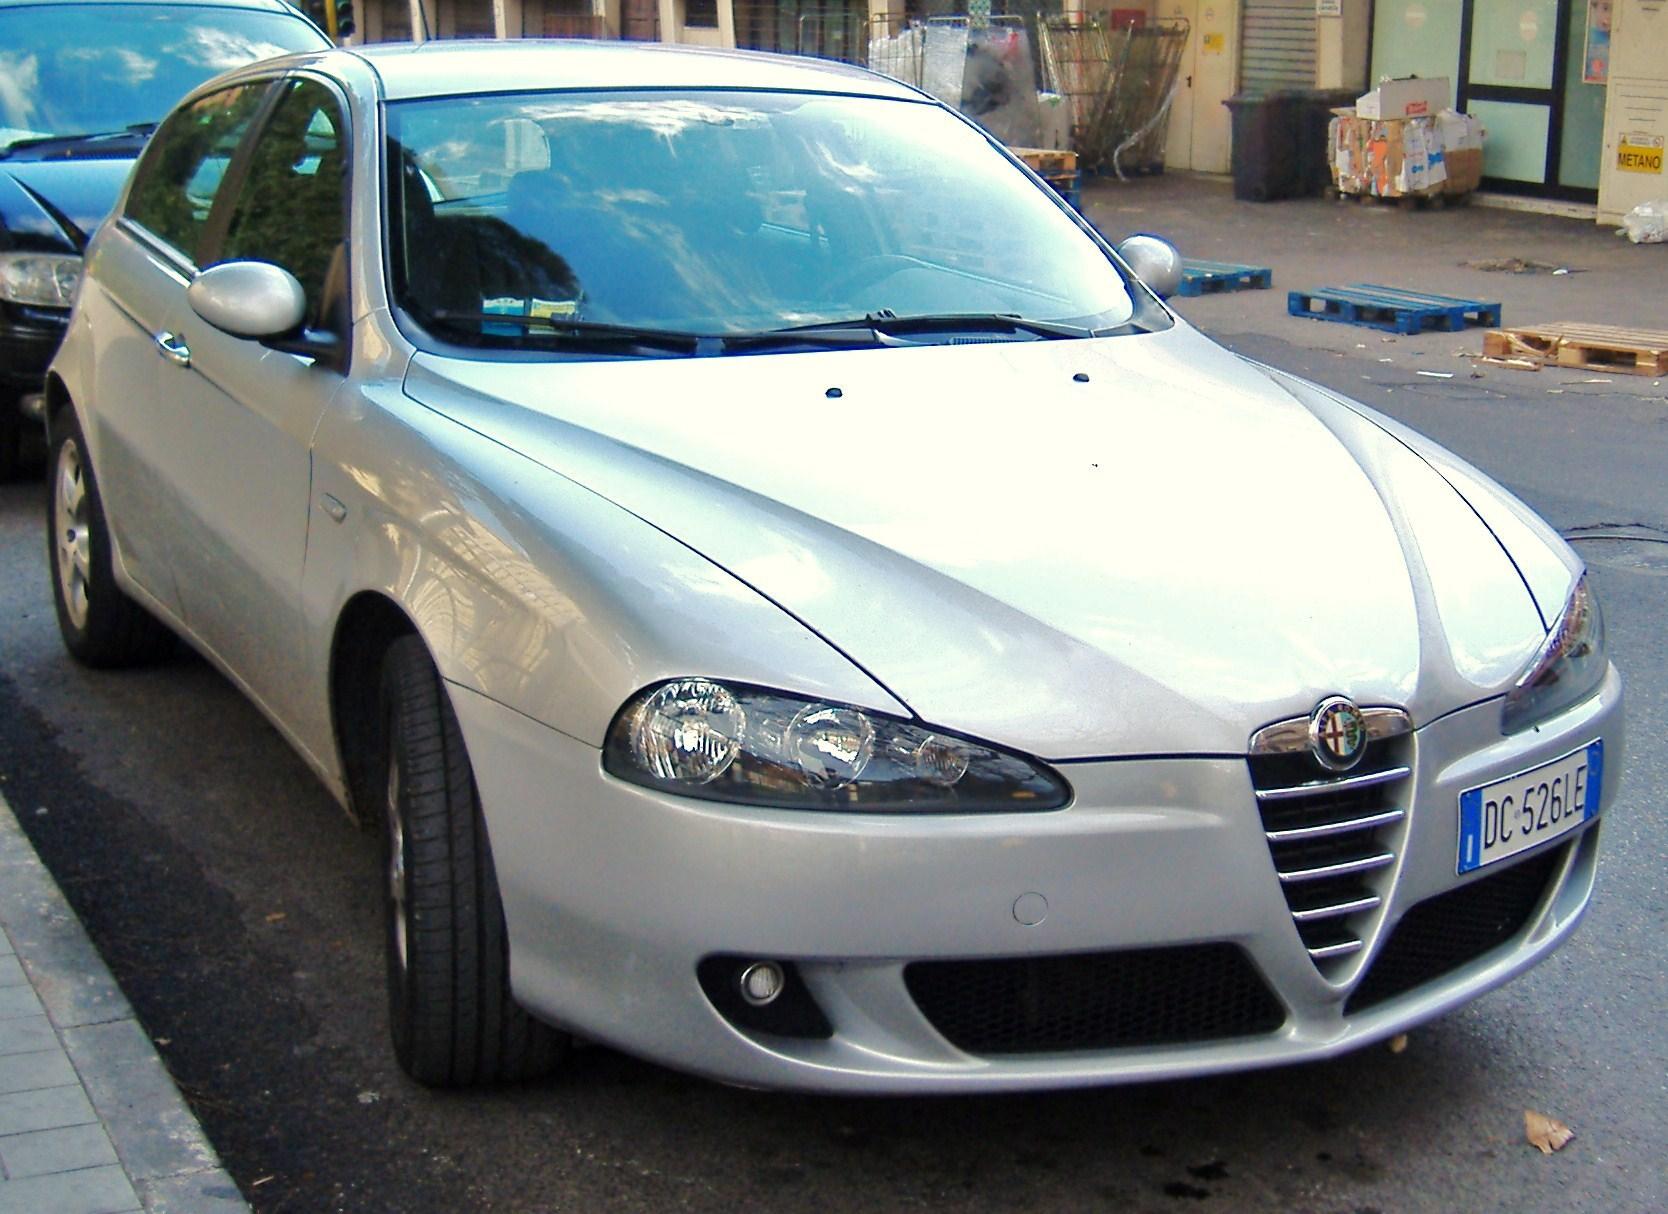 File:Alfa Romeo 147 1.6 Twin Spark Serie 4 2010.JPG - Wikipedia